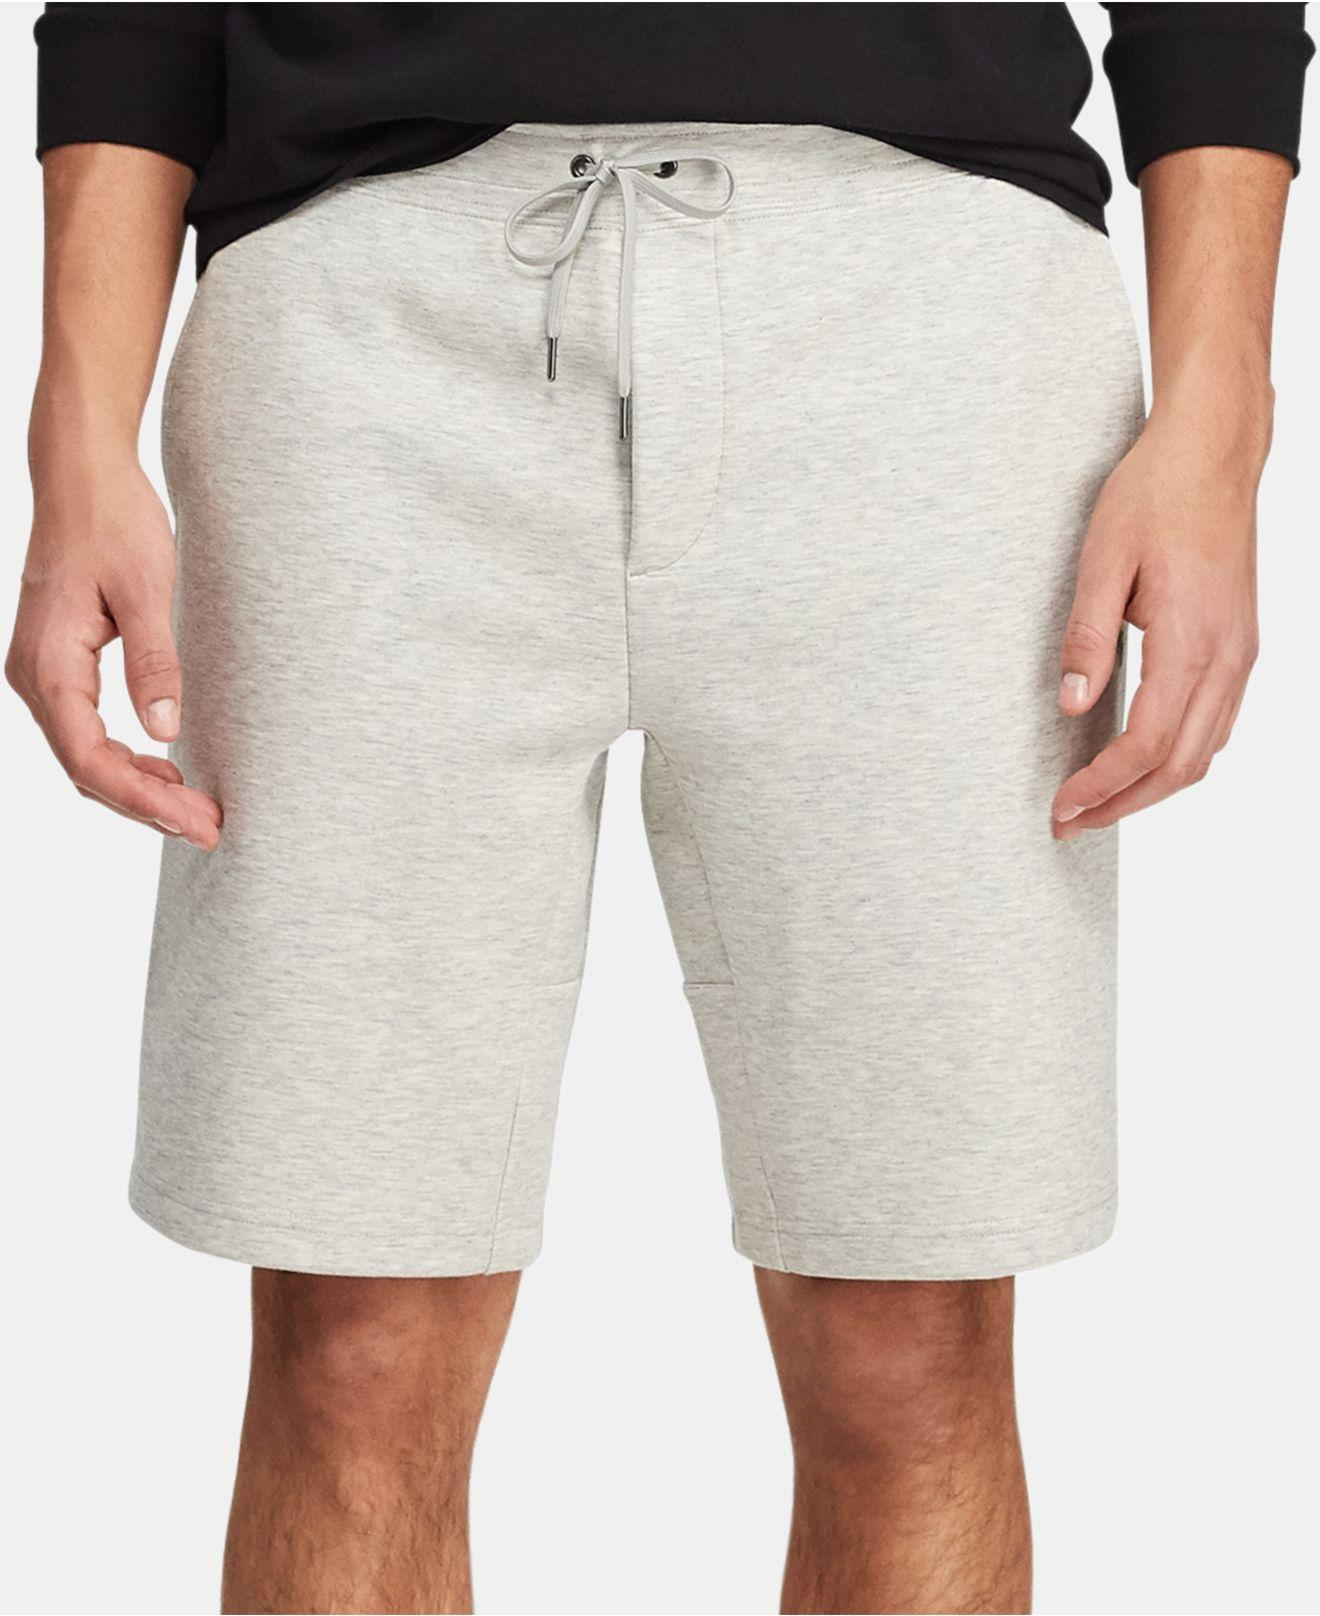 bac5f3cb8 Lyst - Polo Ralph Lauren Double-knit Active Shorts for Men